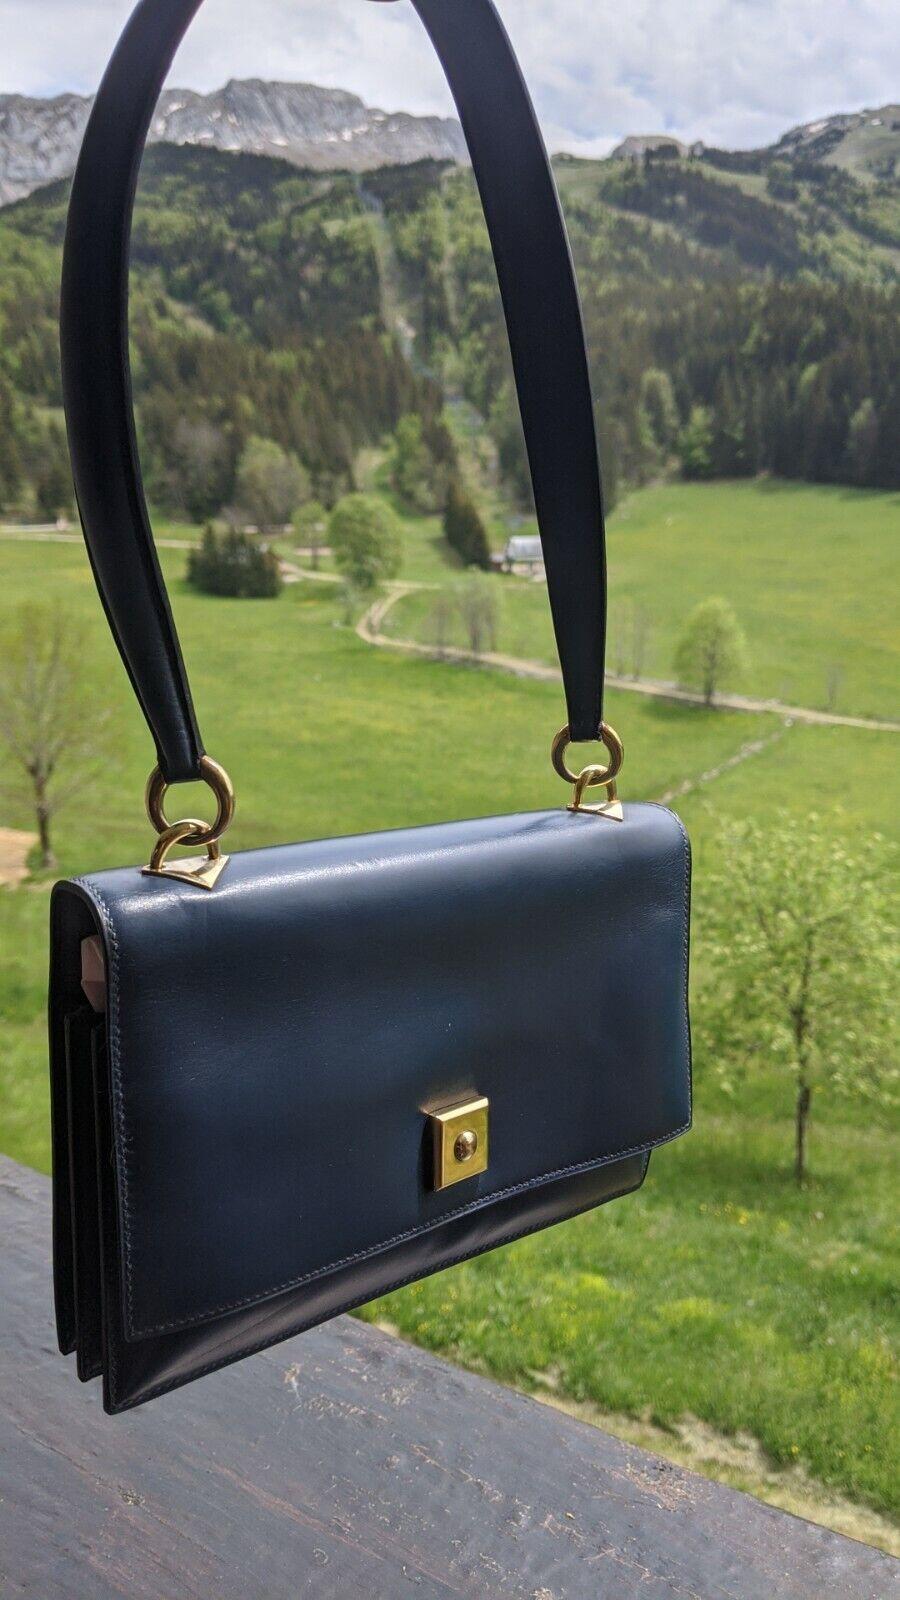 Hermes paris, vintage, sac piano, handbag, cuir, leather